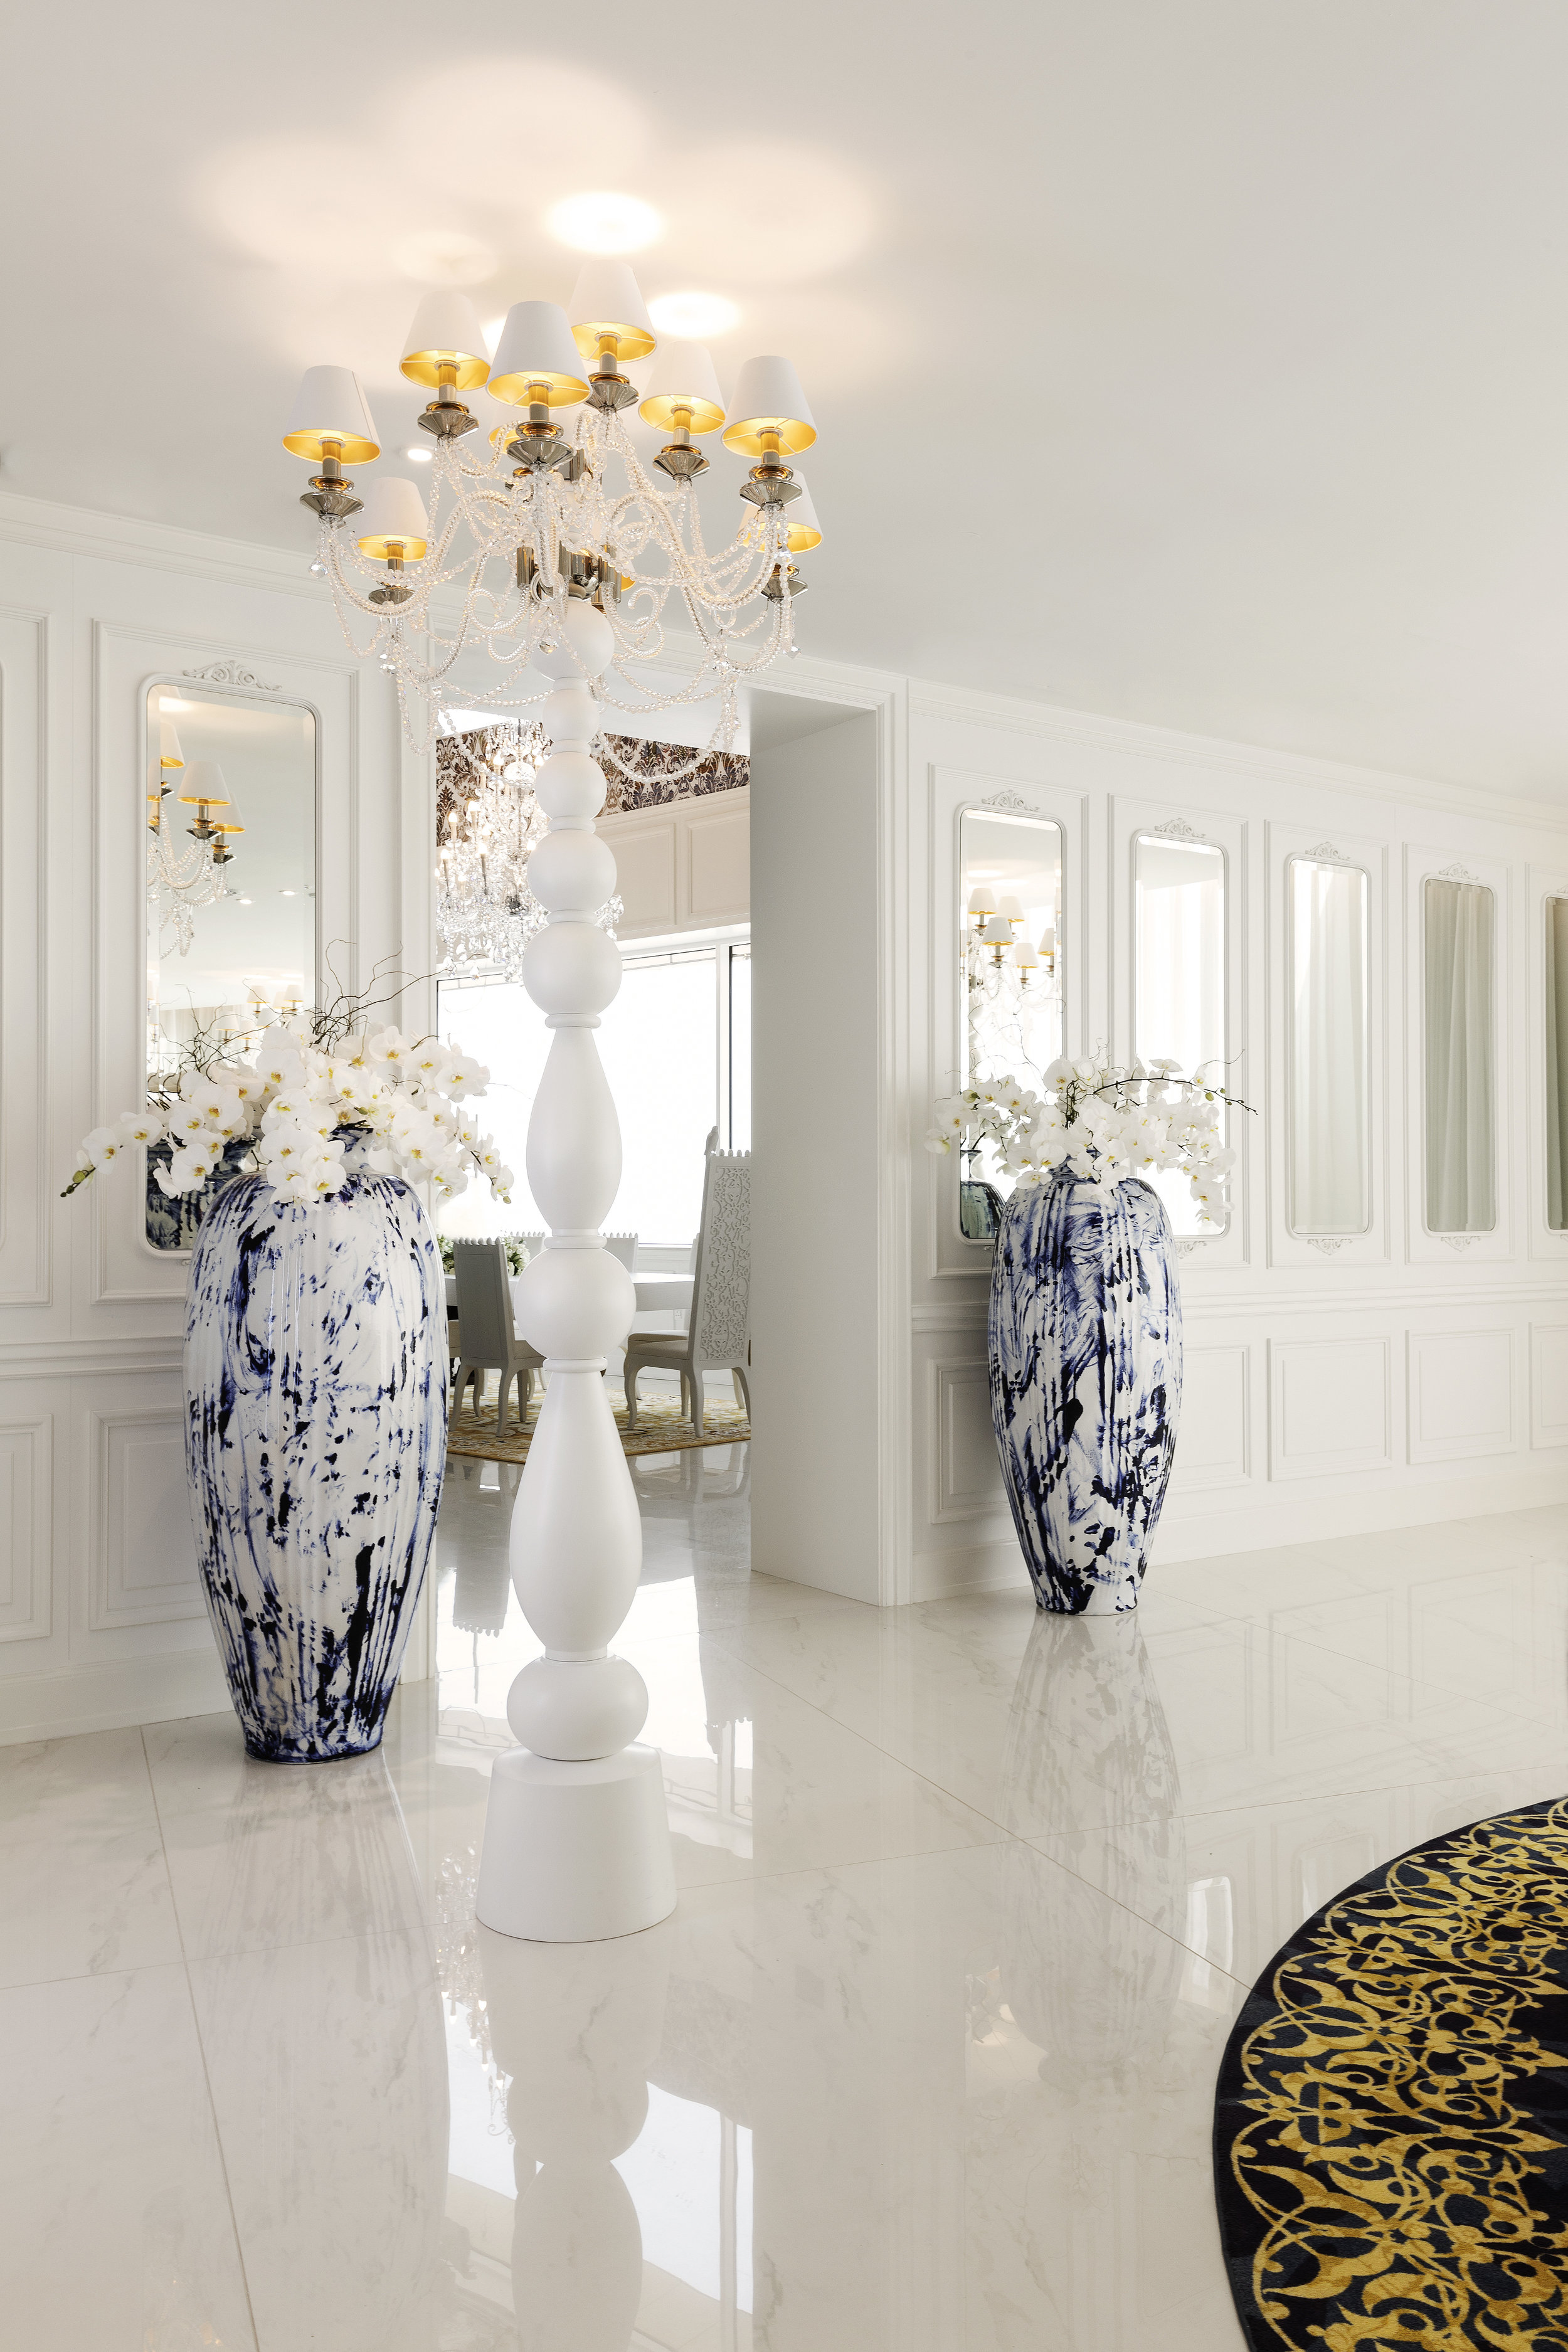 MW_MondrianDoha_Penthouse_10.jpg